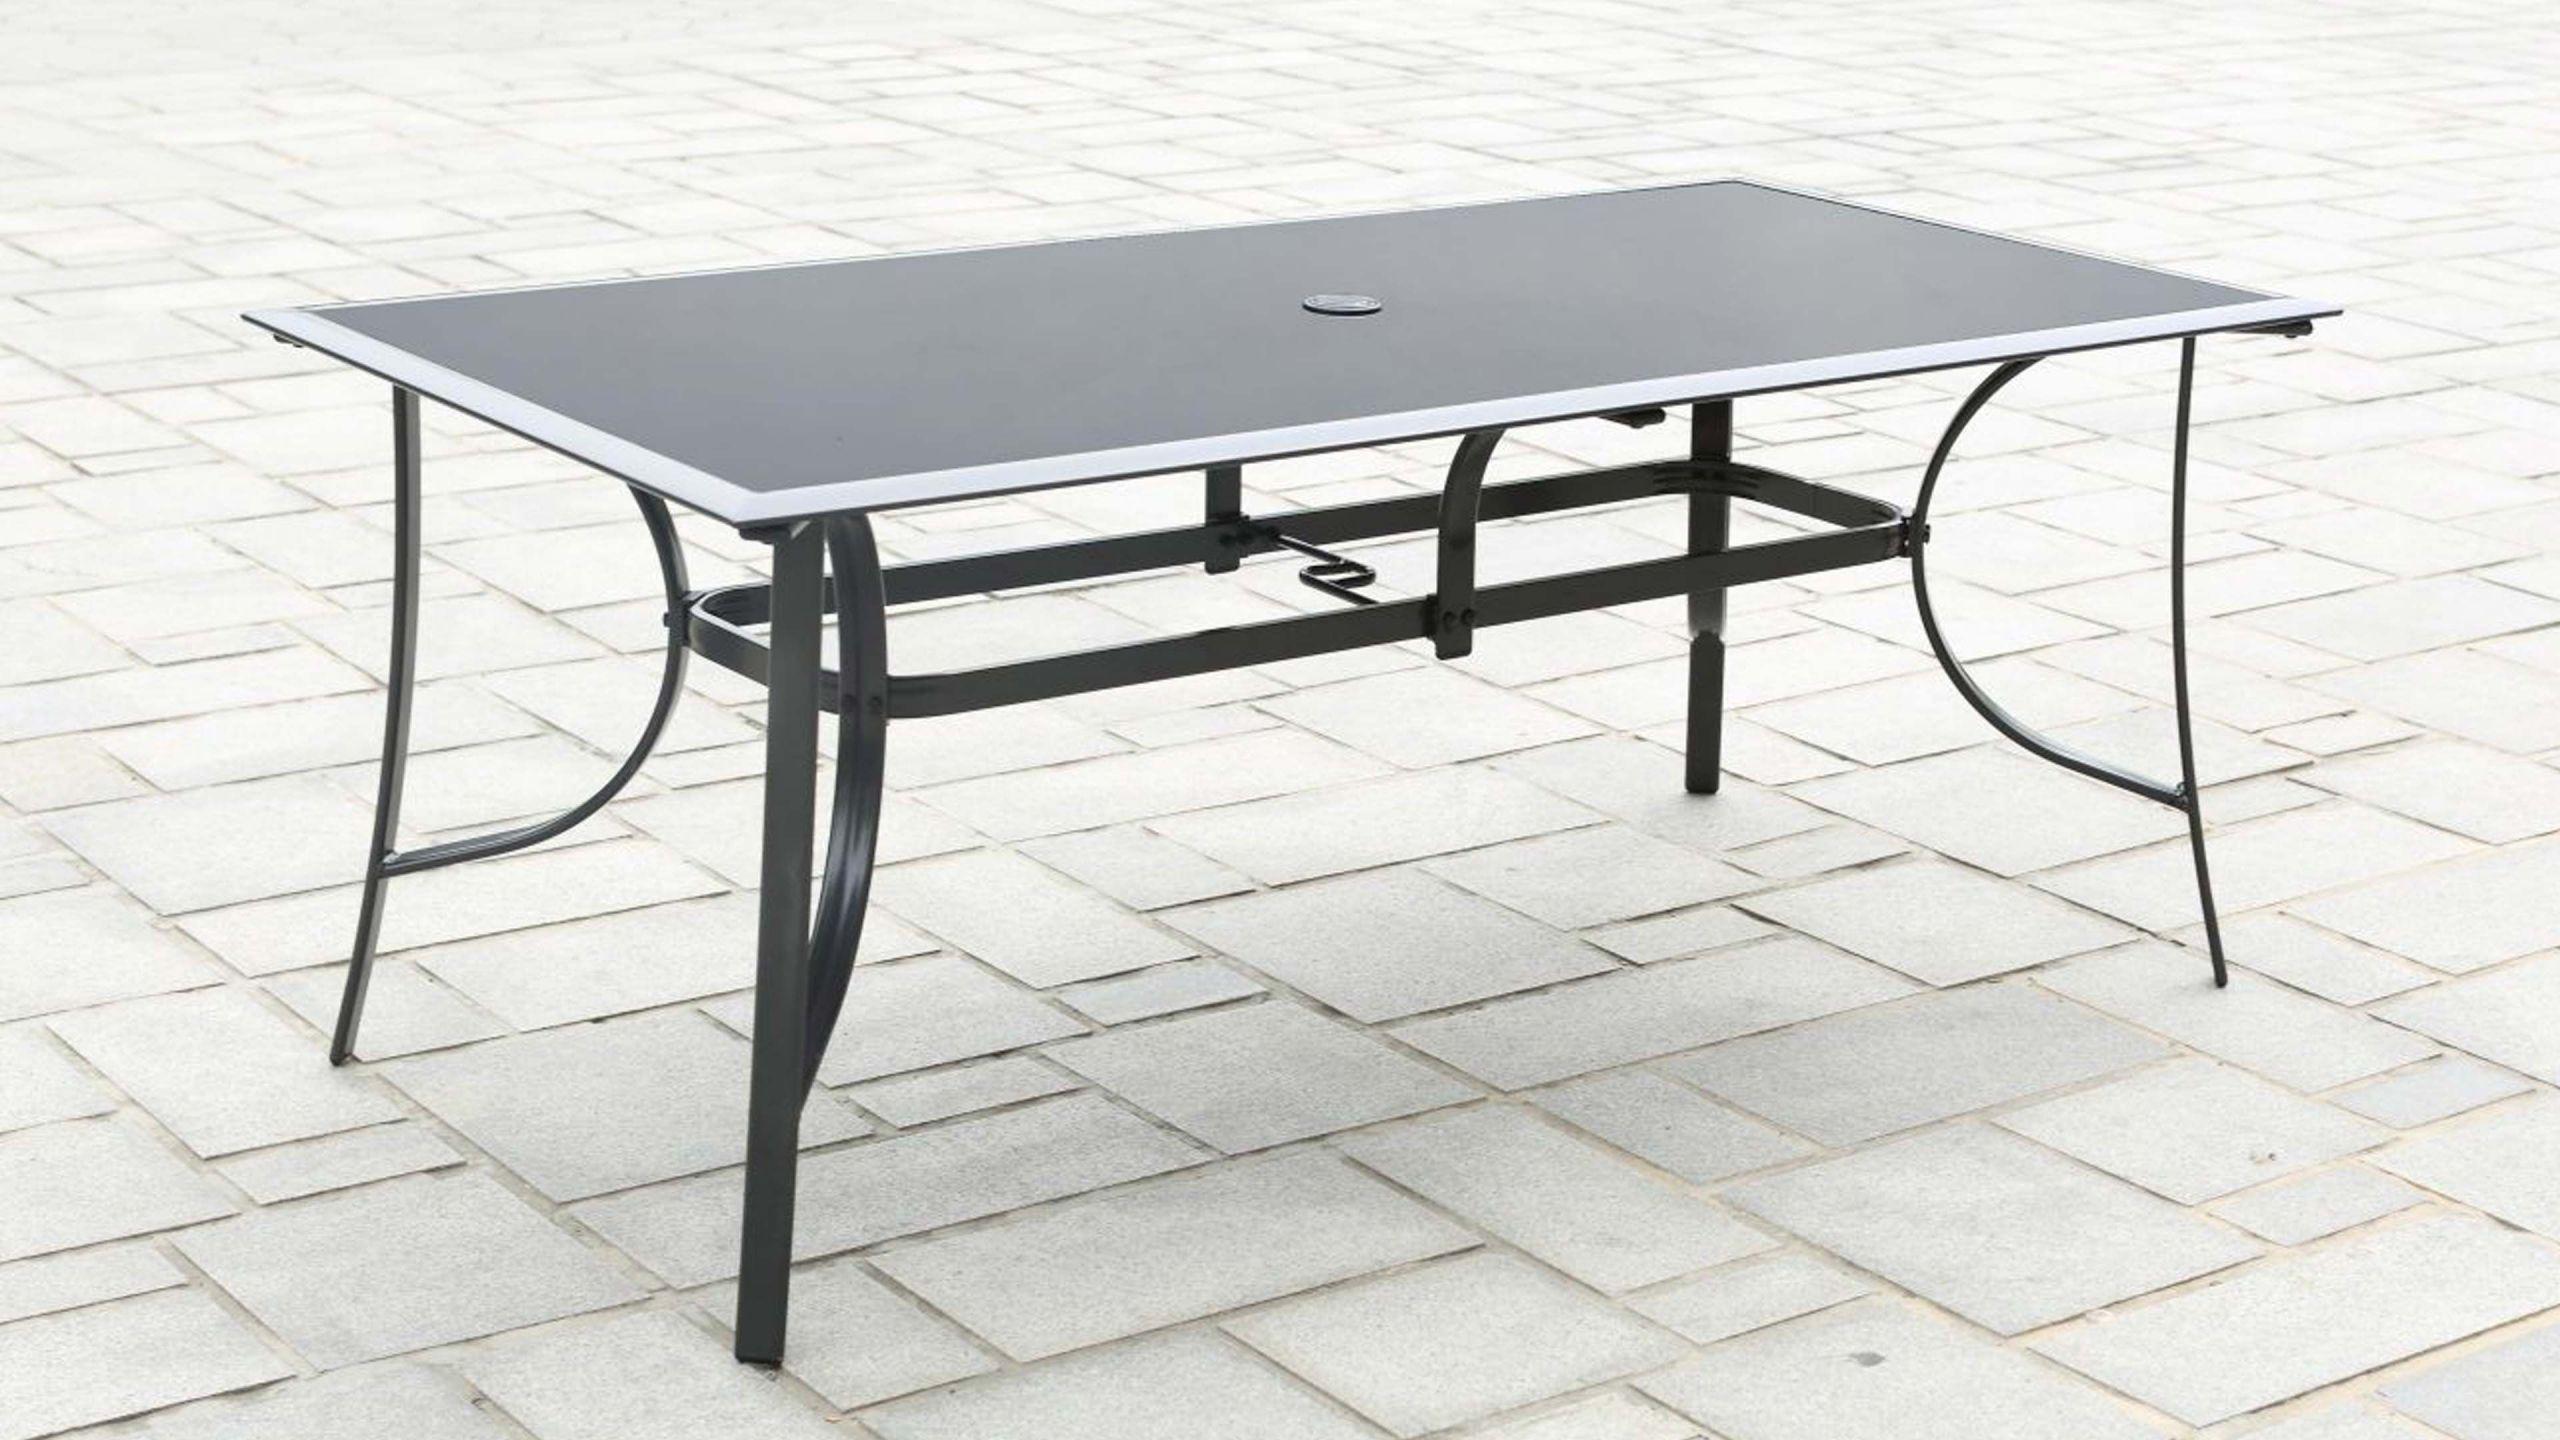 Table De Jardin Aluminium Des Idées - Idees Conception Jardin avec Salon De Jardin Aluminium Et Verre